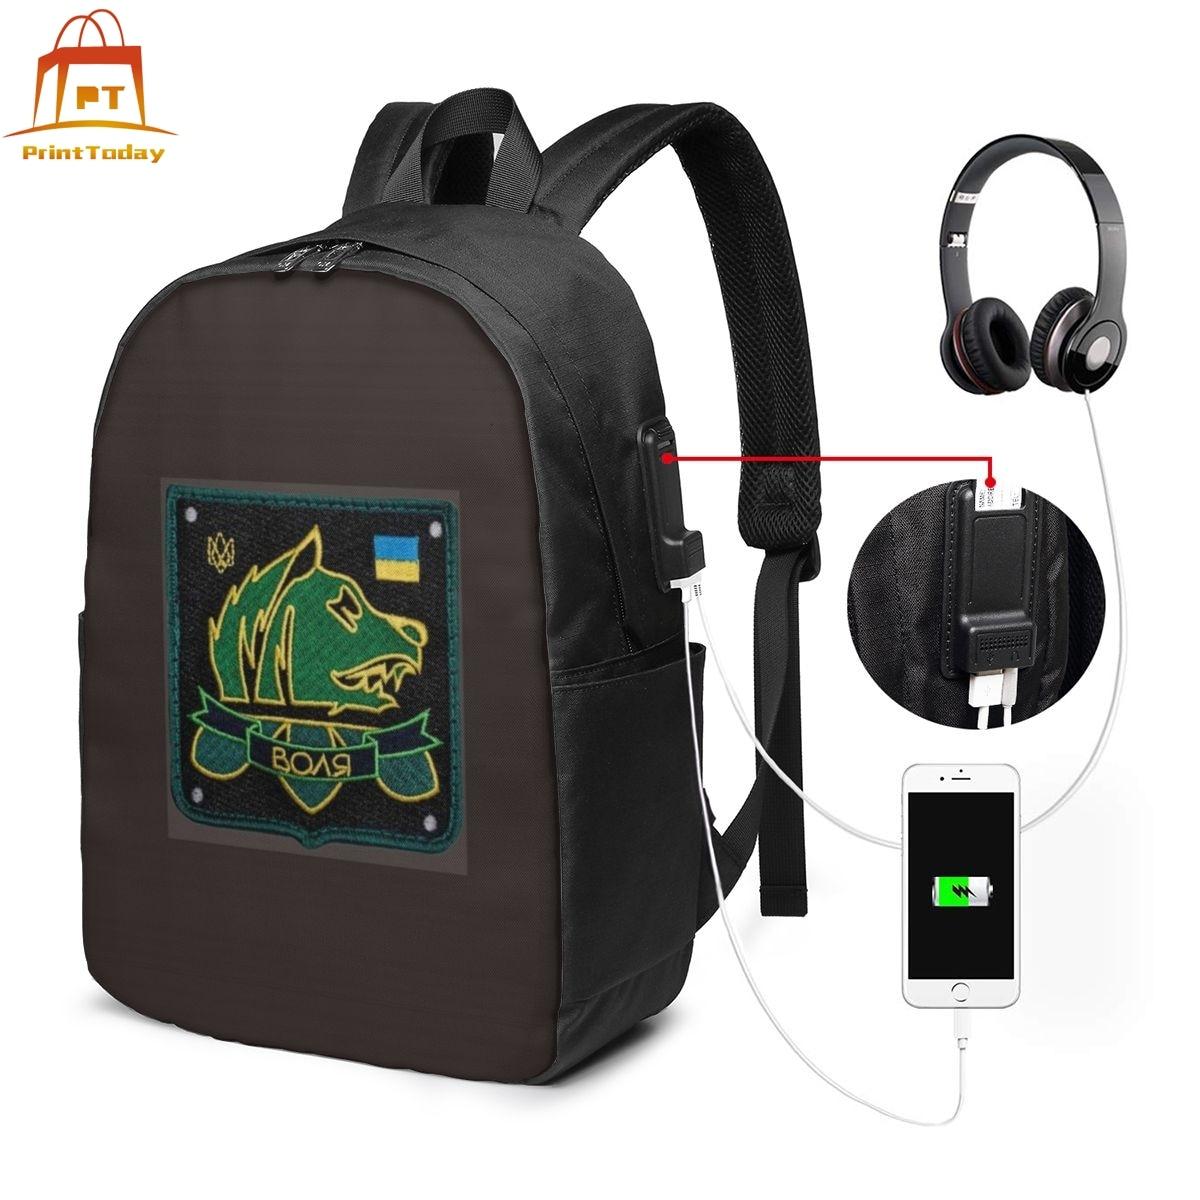 Stalker Backpack Stalker Backpacks Print Student Bag Trend Man - Woman Travel High Quality Multi Function Bags